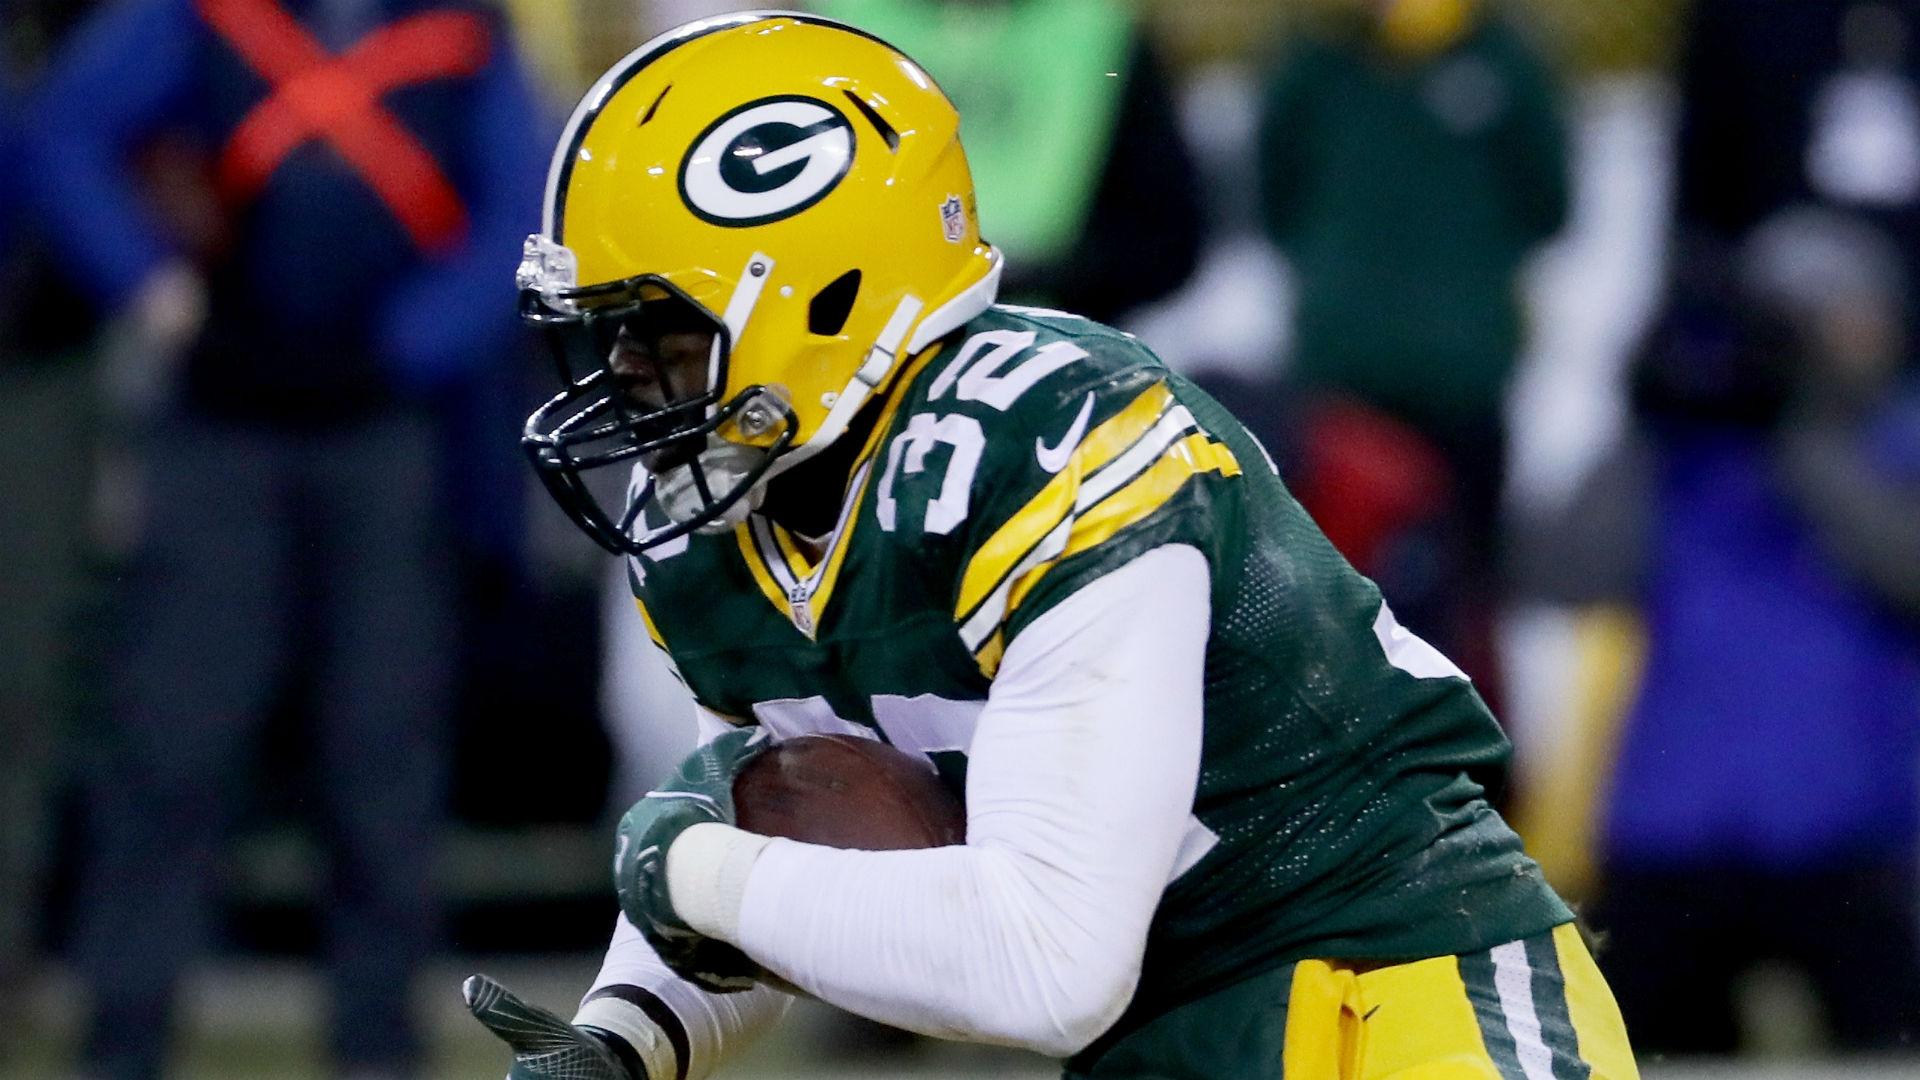 Packers draft CB King, S Jones, DT Adams